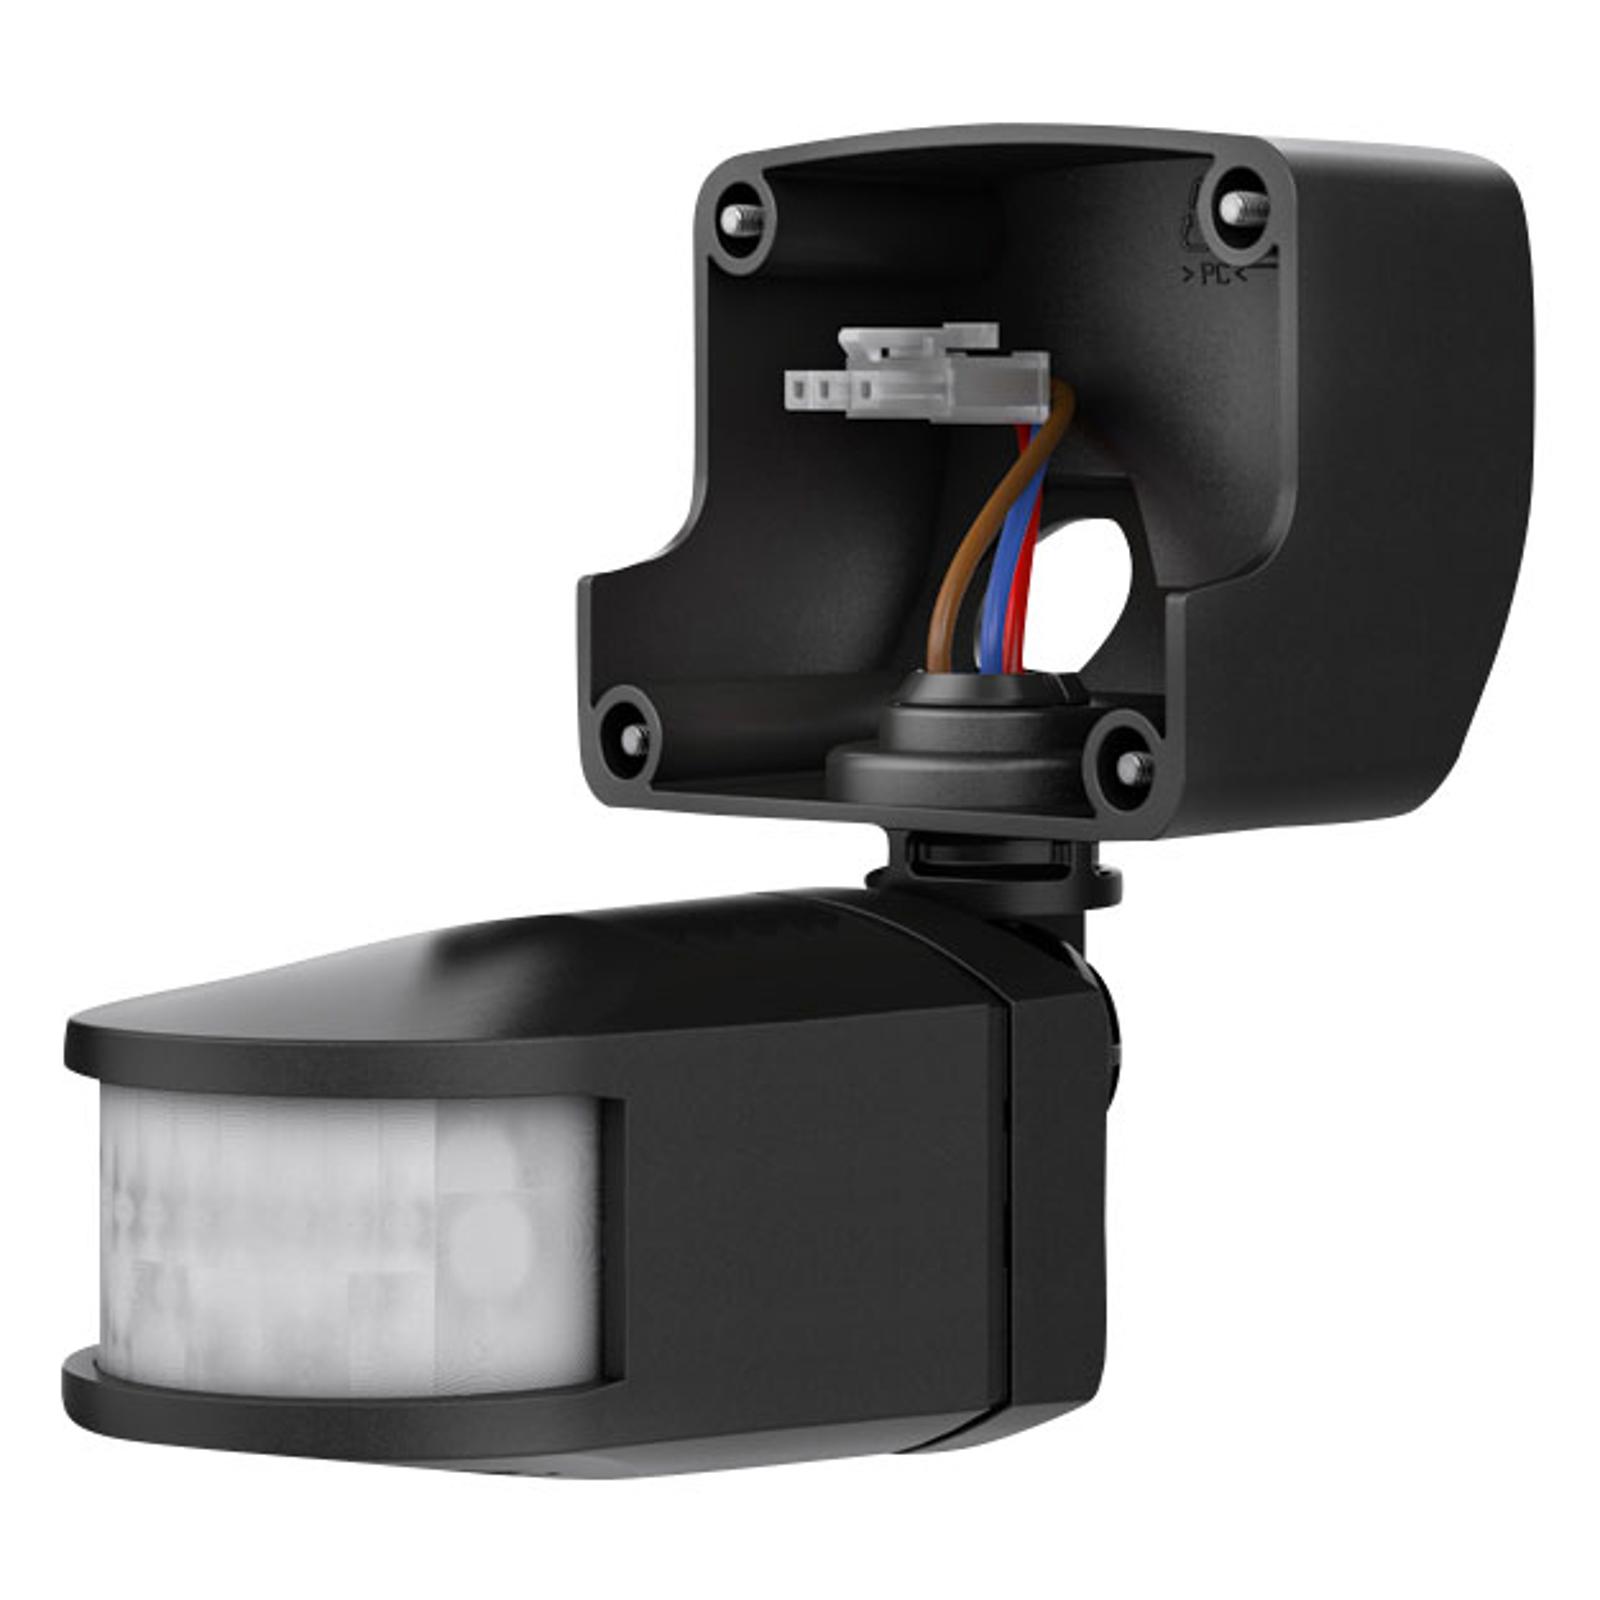 Theben theLeda B-sensor RC + fjernstyrt, svart